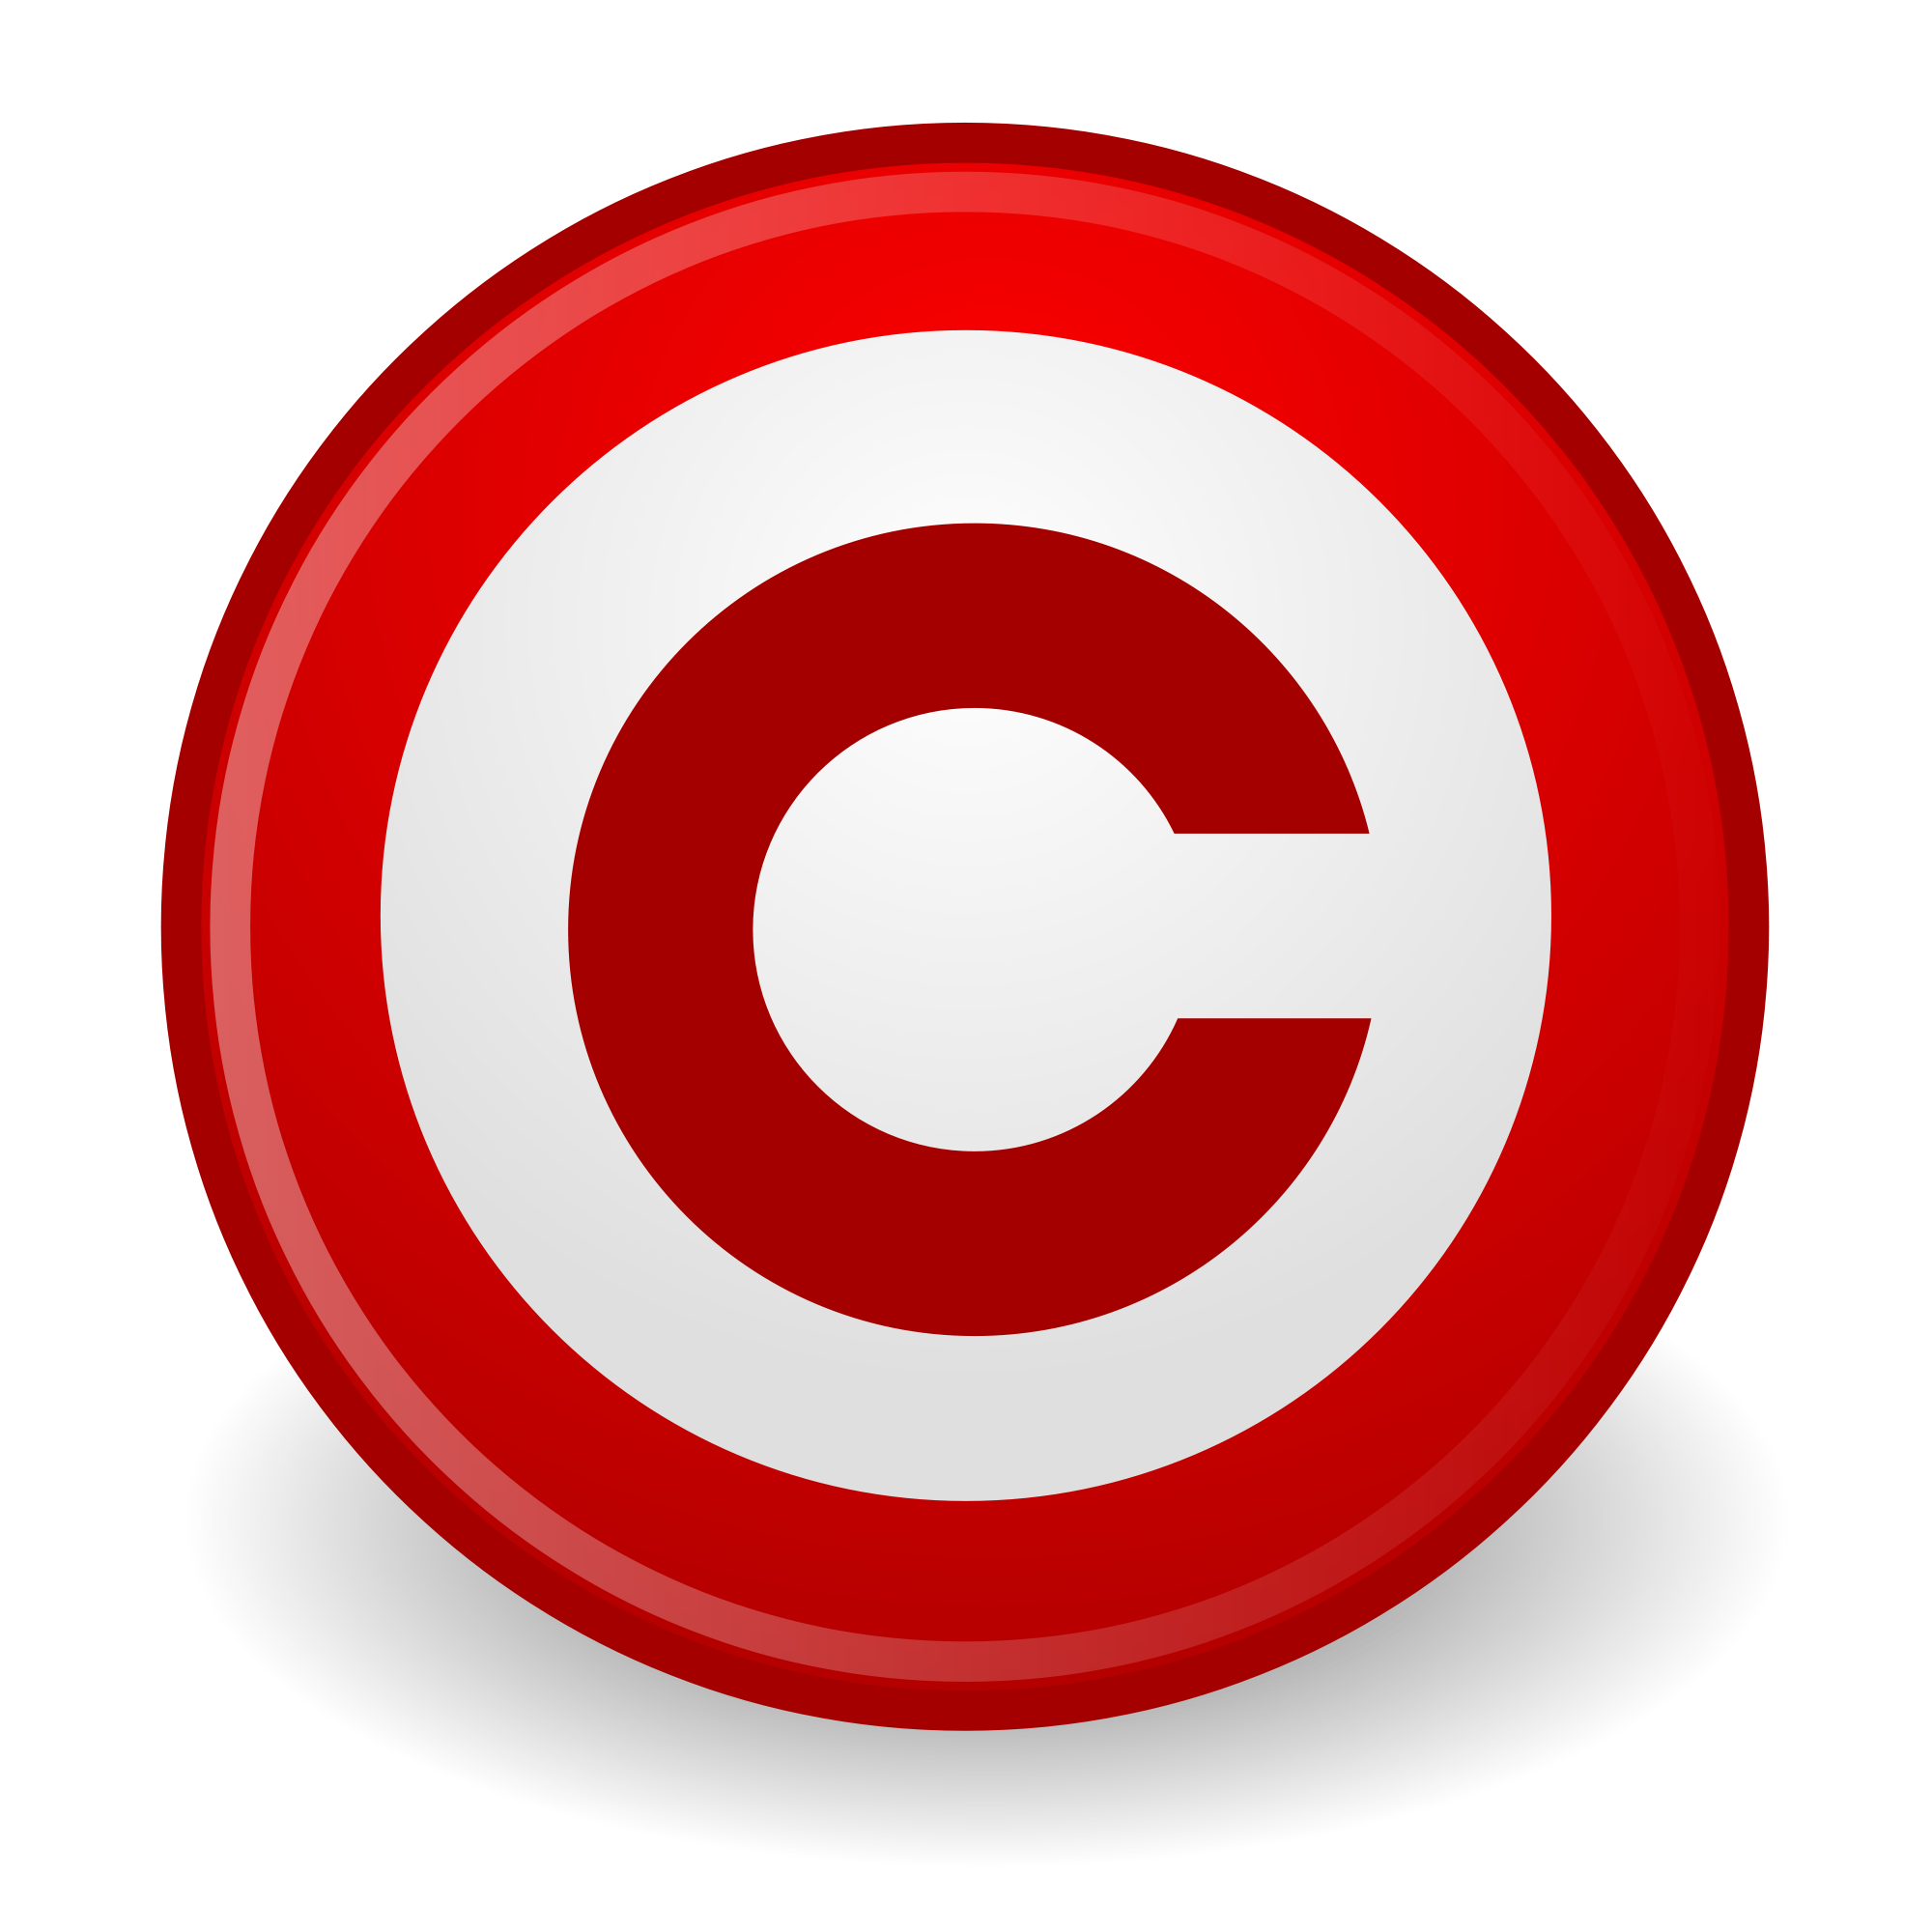 Copyright Symbol PNG, Copyright Clipart, Logo Free Download.